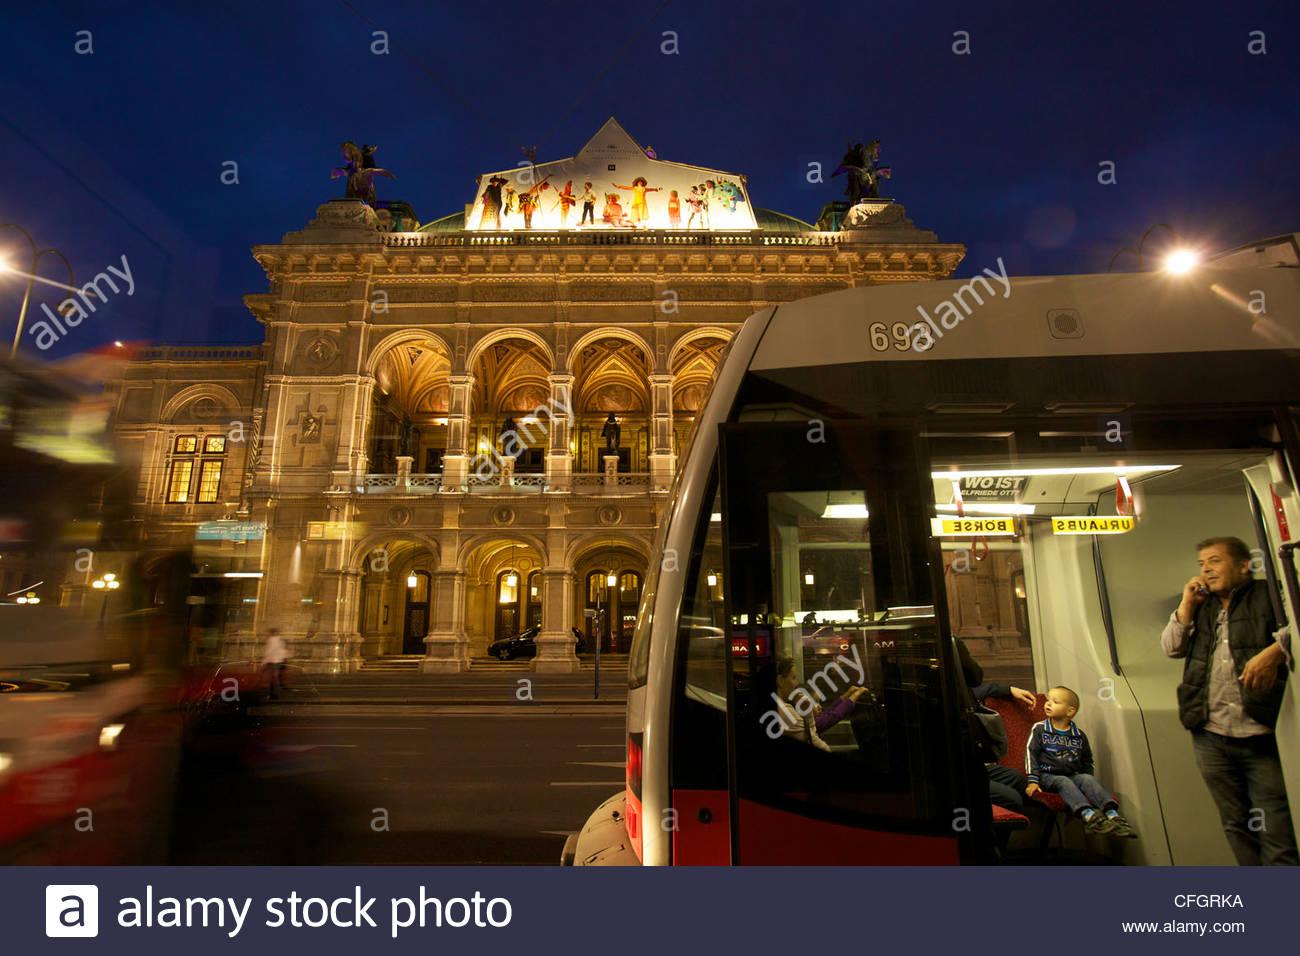 Tram passengers view the neo-renaissance Vienna State Opera at night. - Stock Image